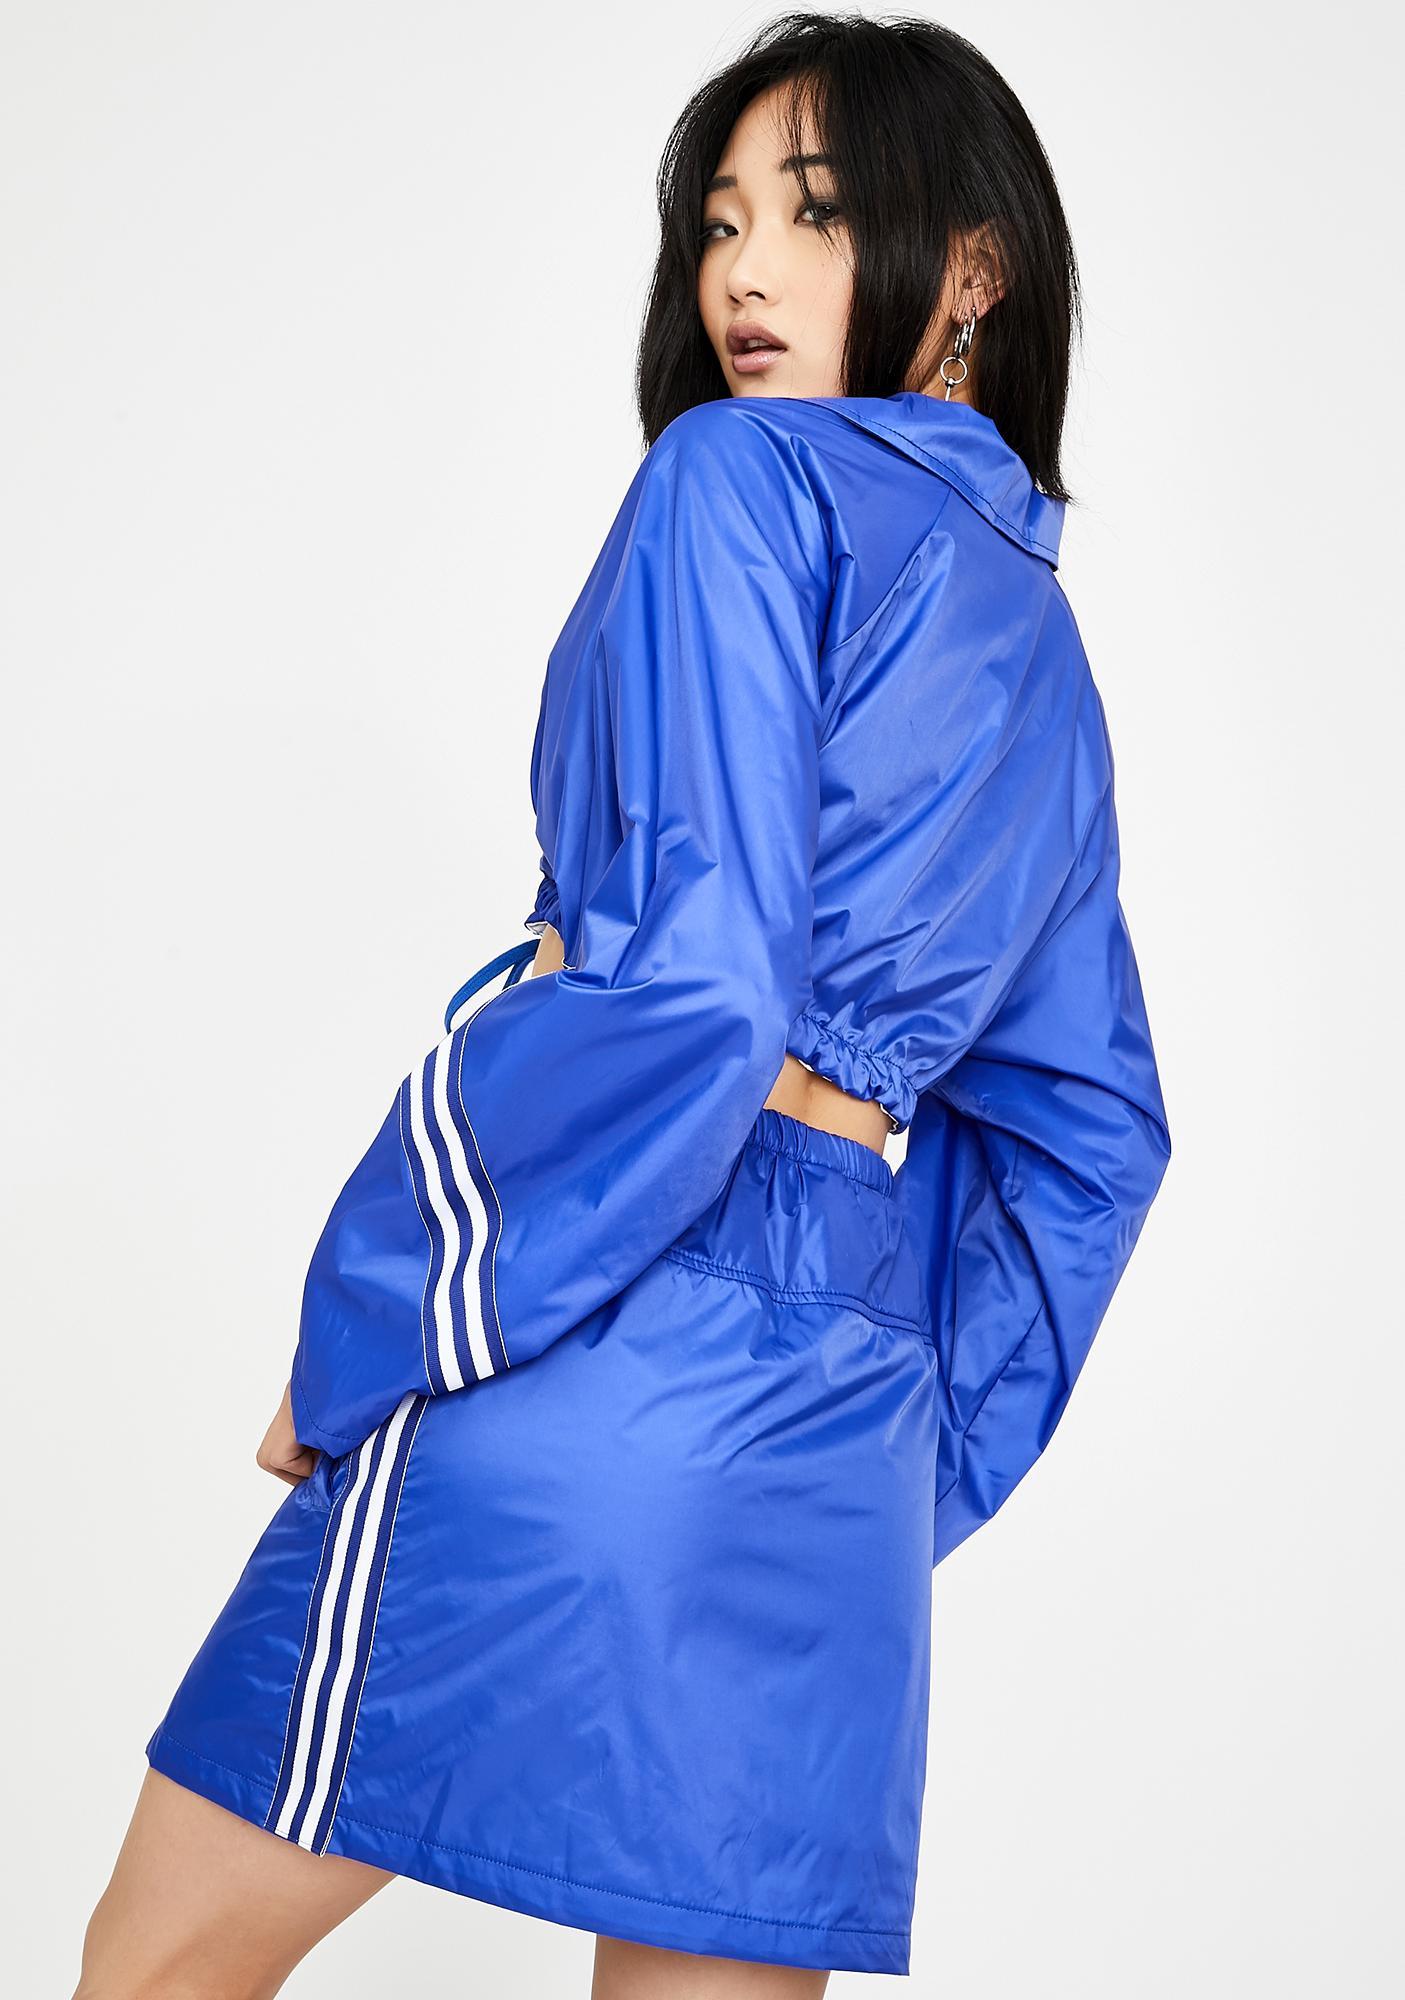 Rojas Berry Chaotic Mini Skirt